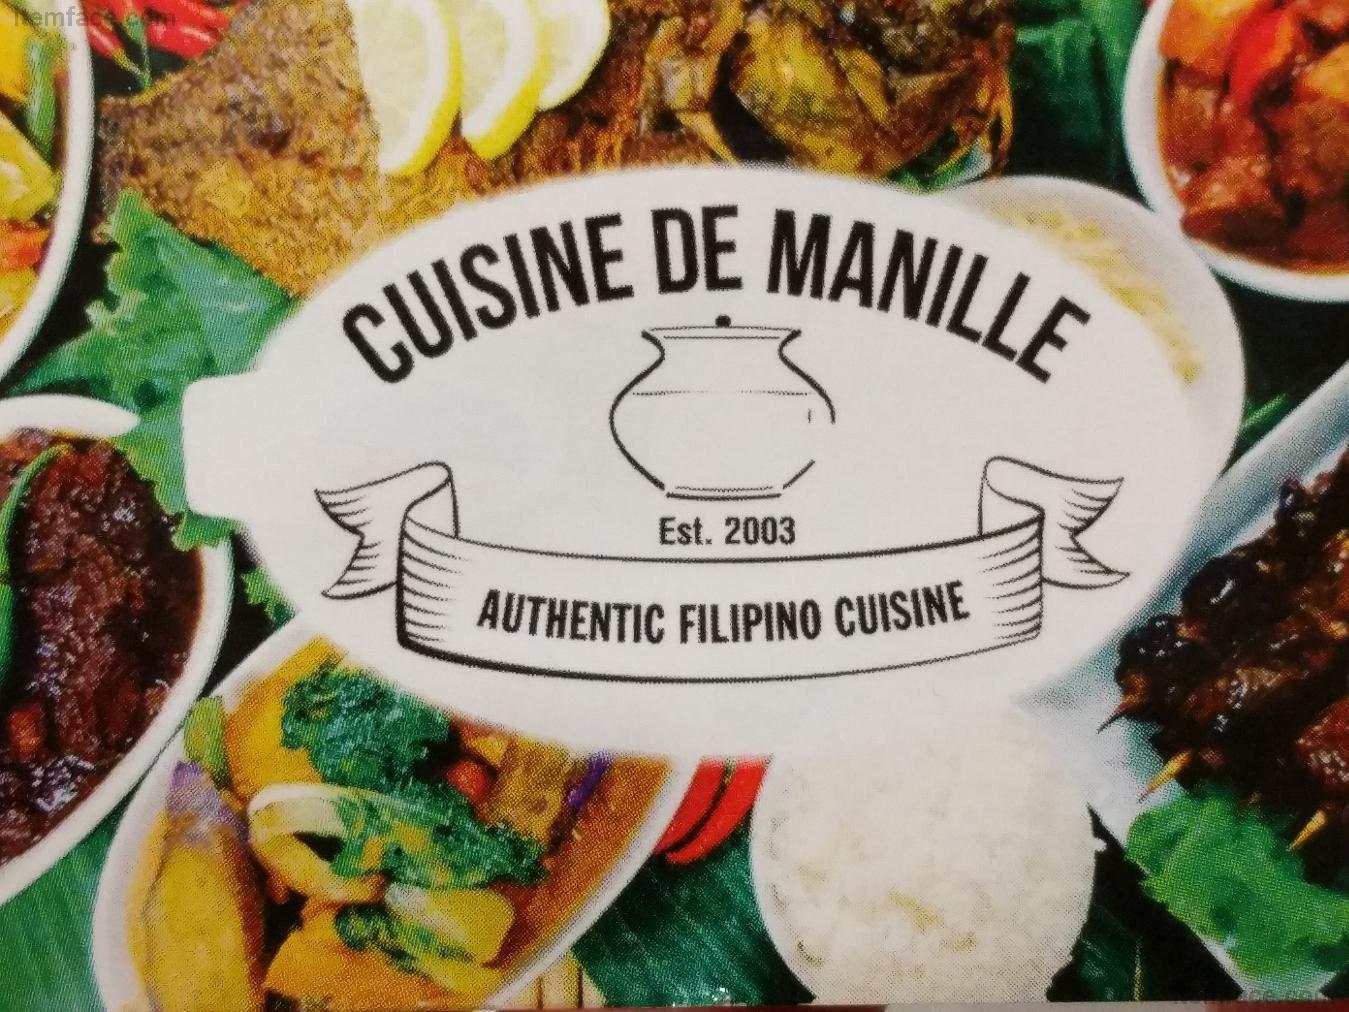 CUISINE DE MANILLE - Restaurant